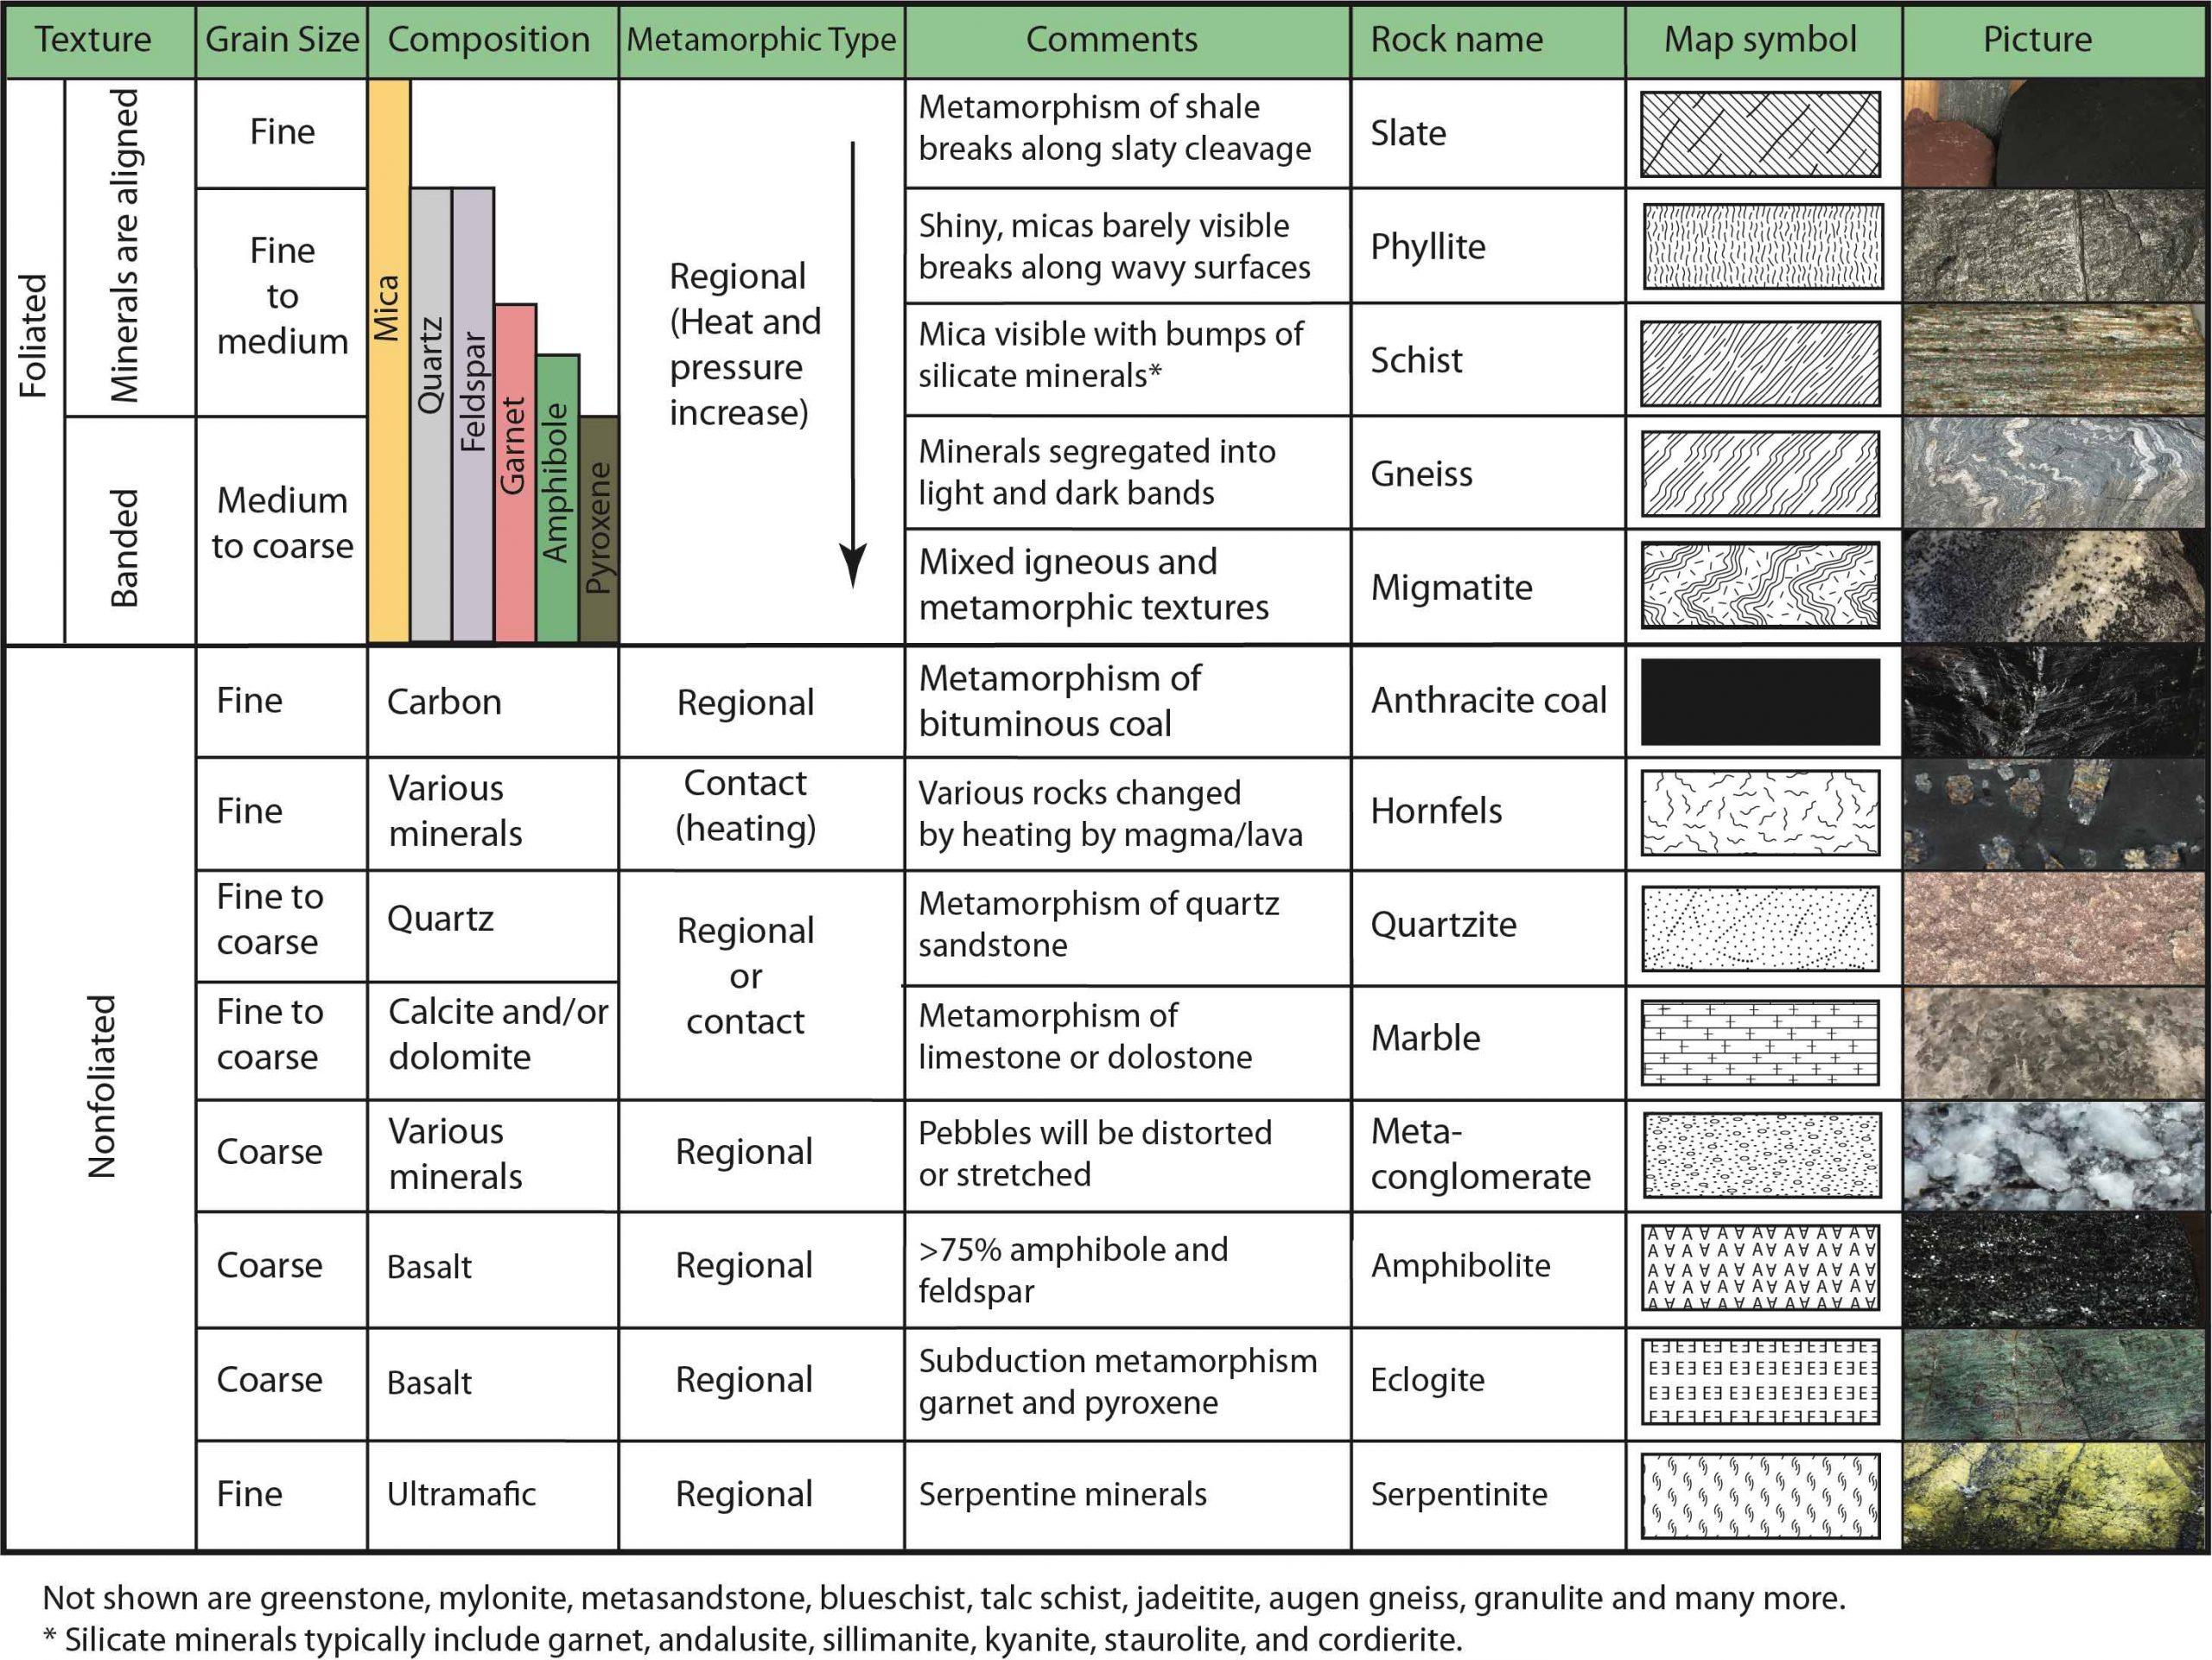 Summary of main characteristics of metamorphic rocks